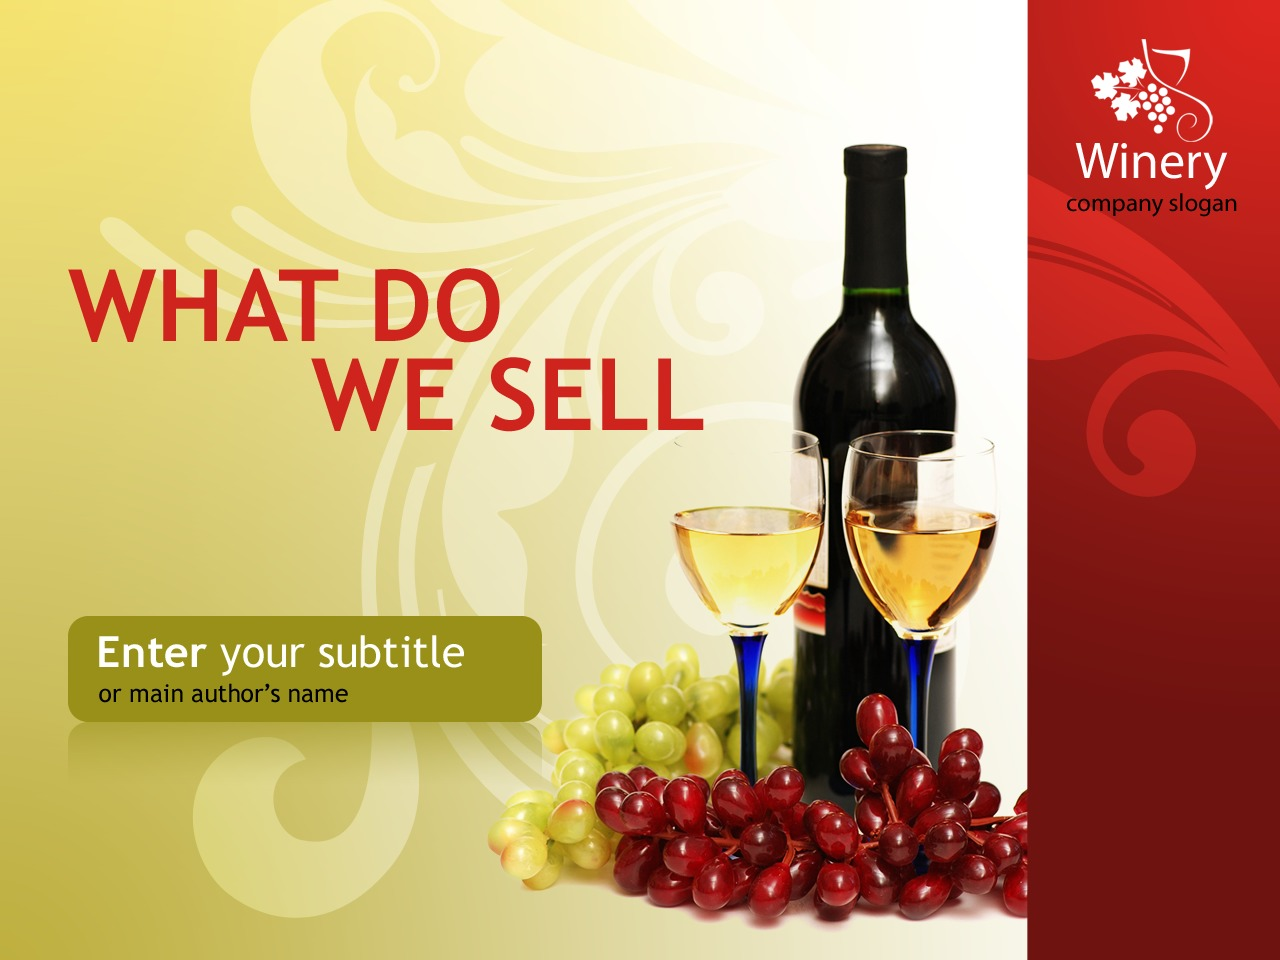 PowerPoint шаблон №31989 на тему виноделие